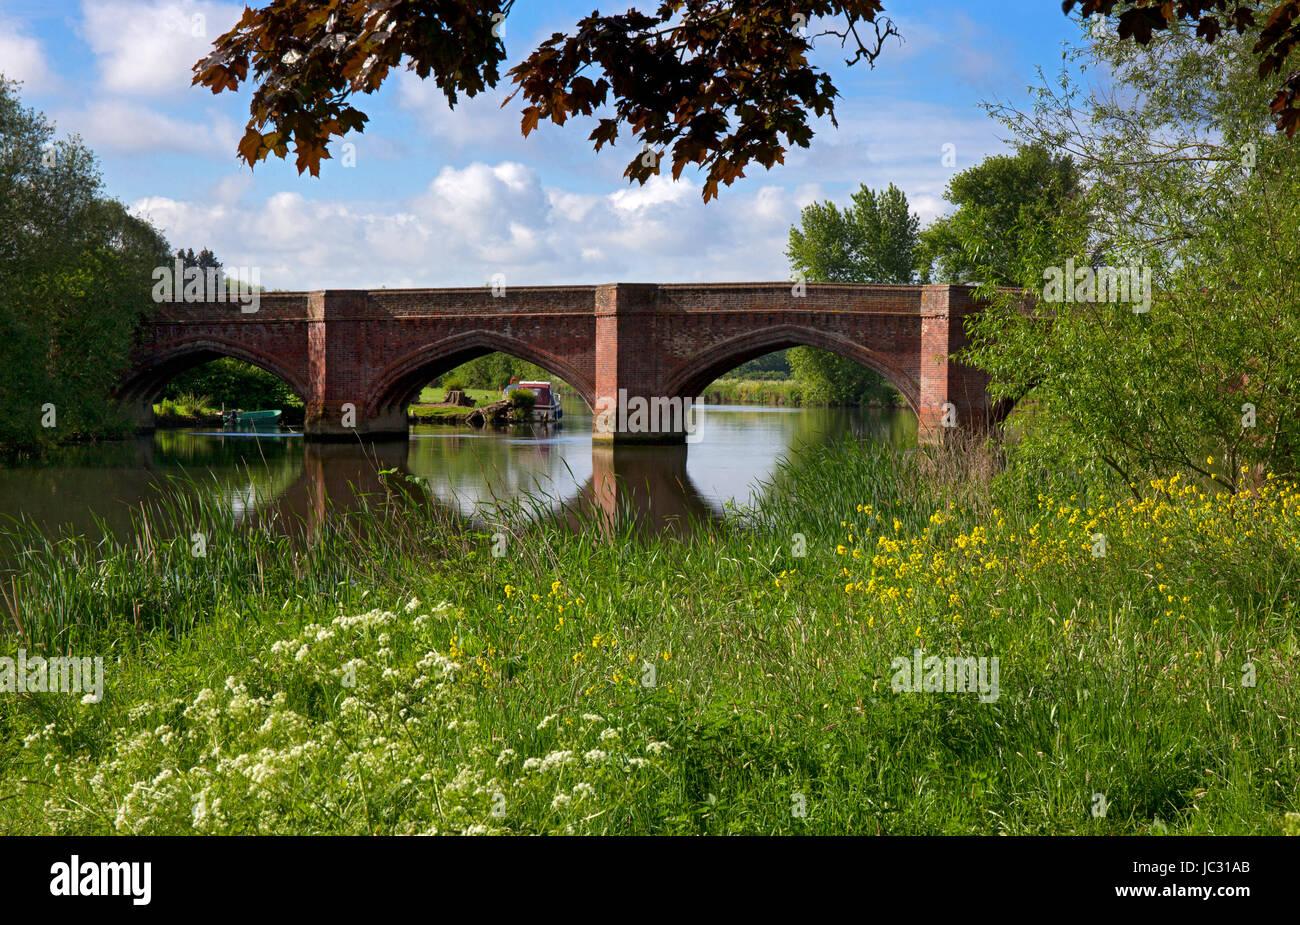 Bridge and river Thames at Clifton Hamden, Oxfordshire, England - Stock Image